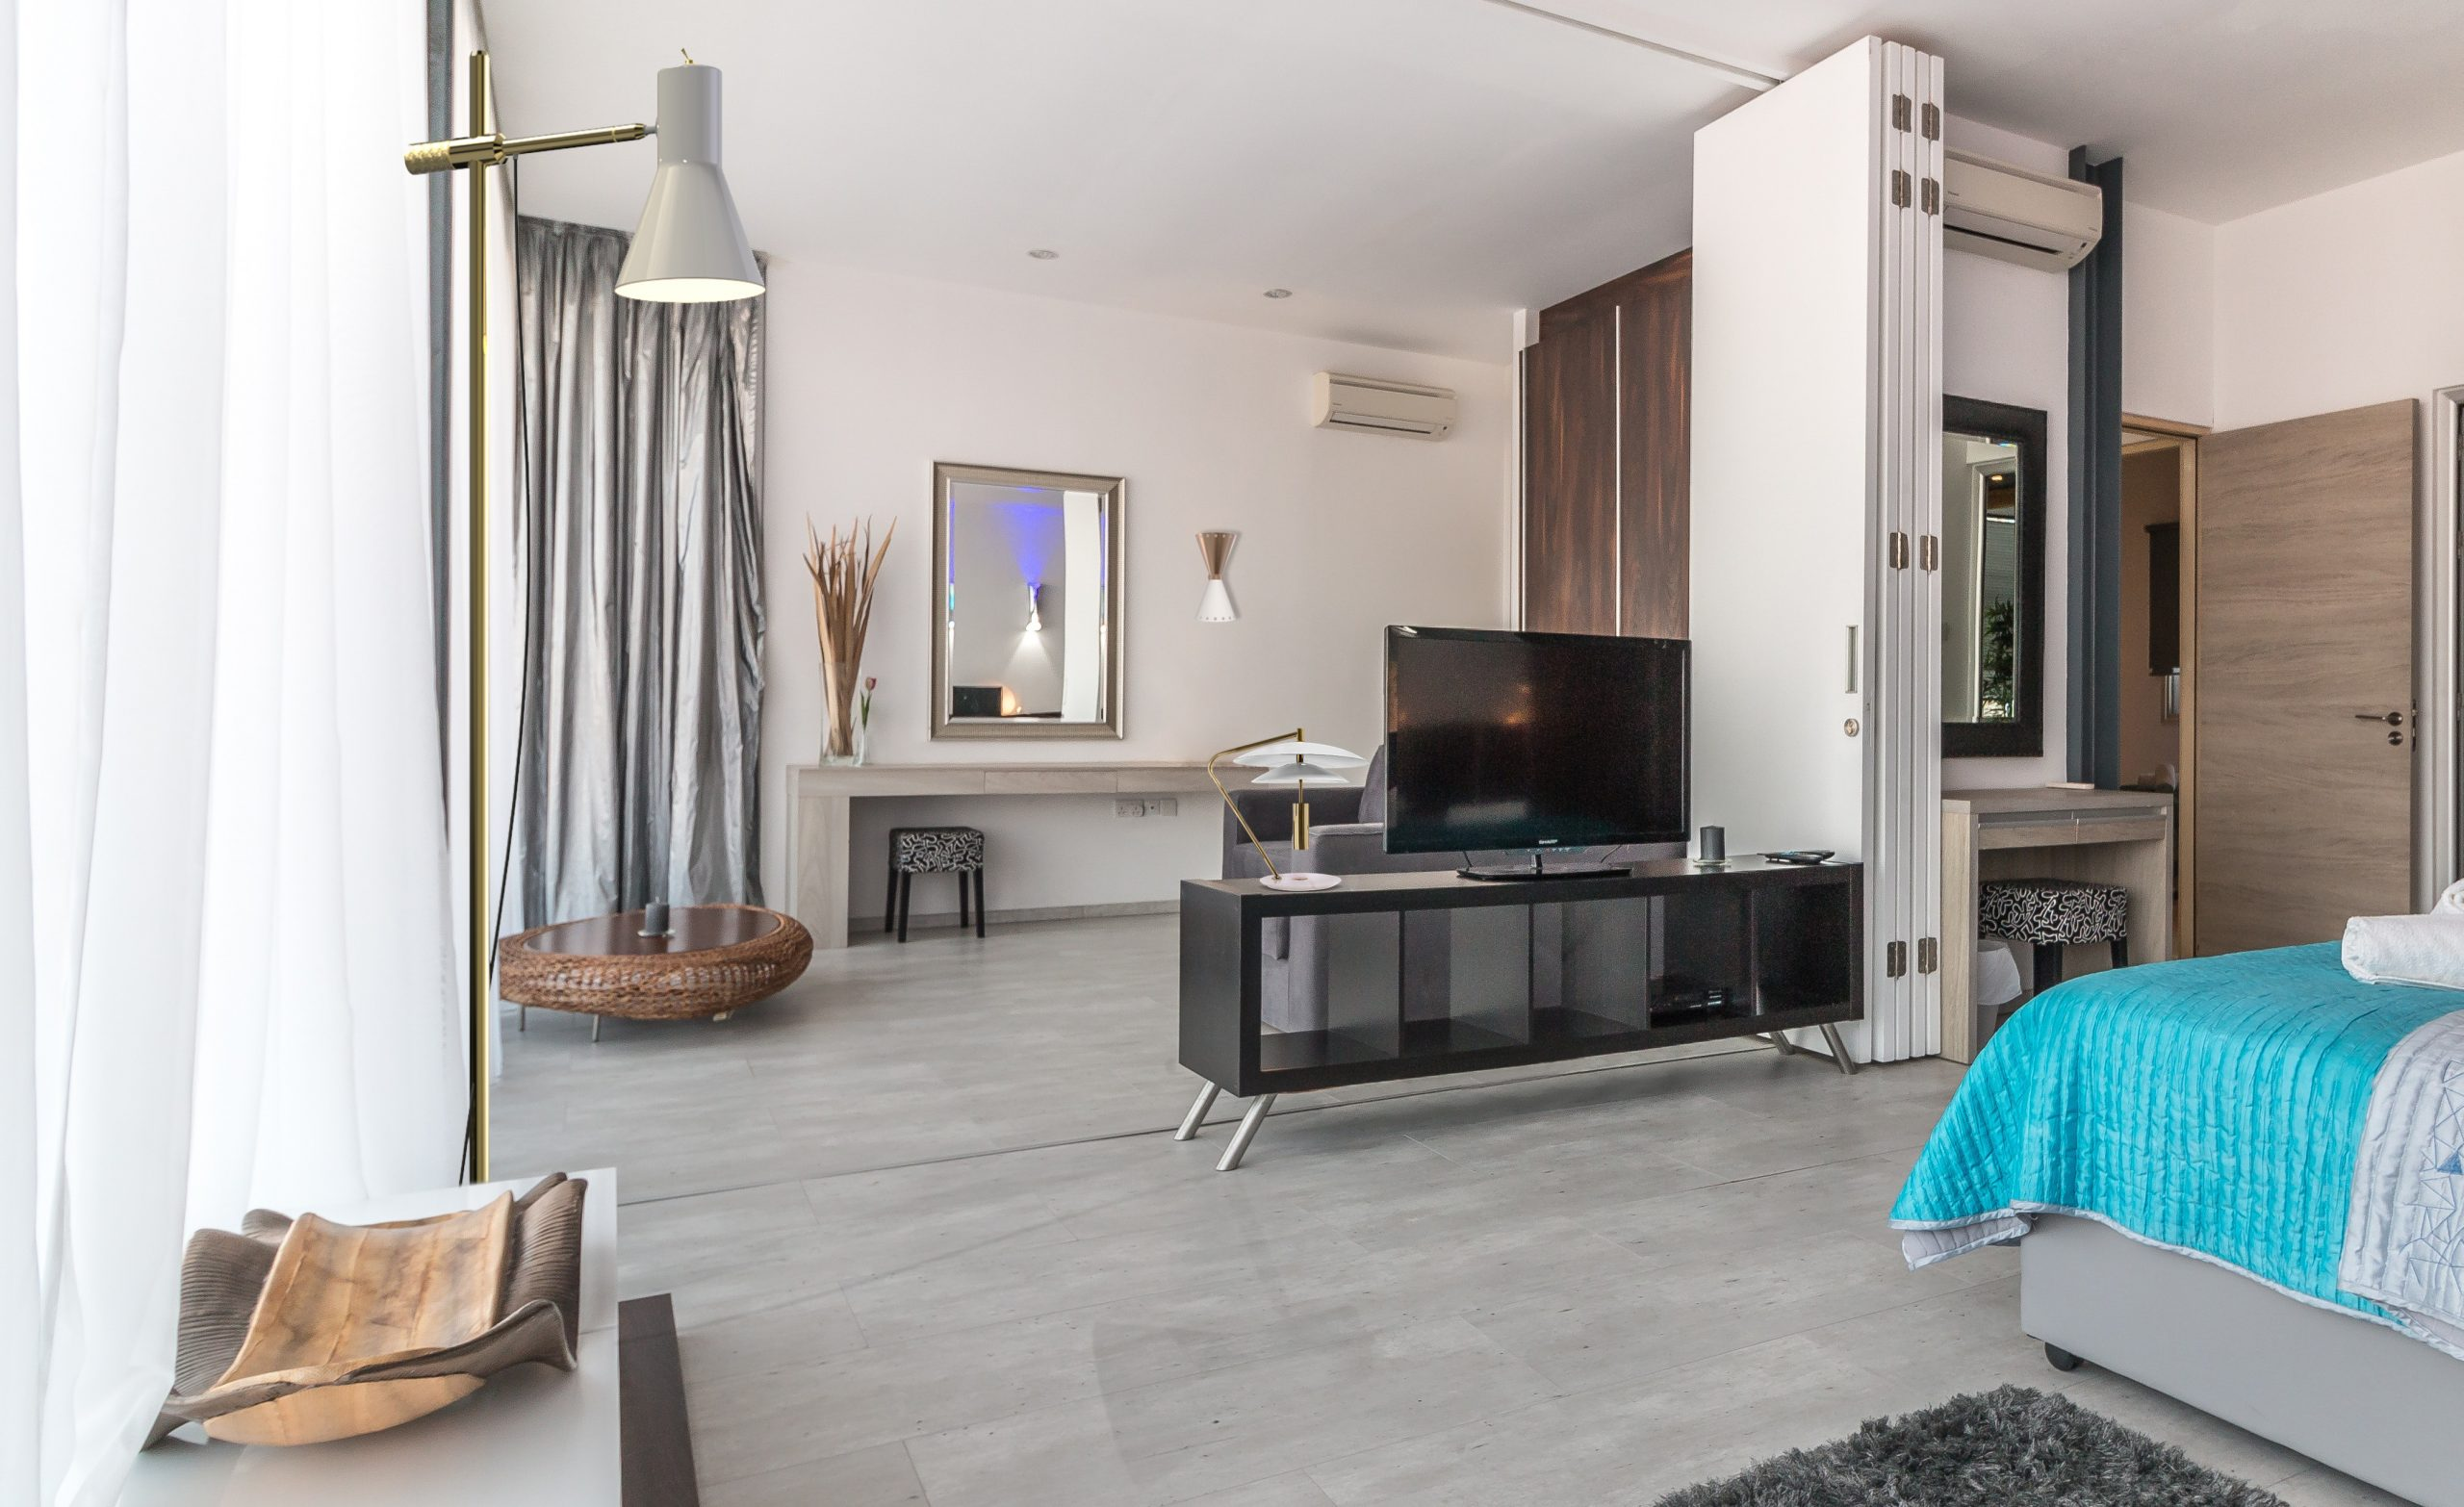 Best Deals: The Perfect TV Room Decor Lighting tv room lighting decor Best Deals: The Perfect TV Room Lighting Decor 📺 coleman piazzolla basie 2 scaled